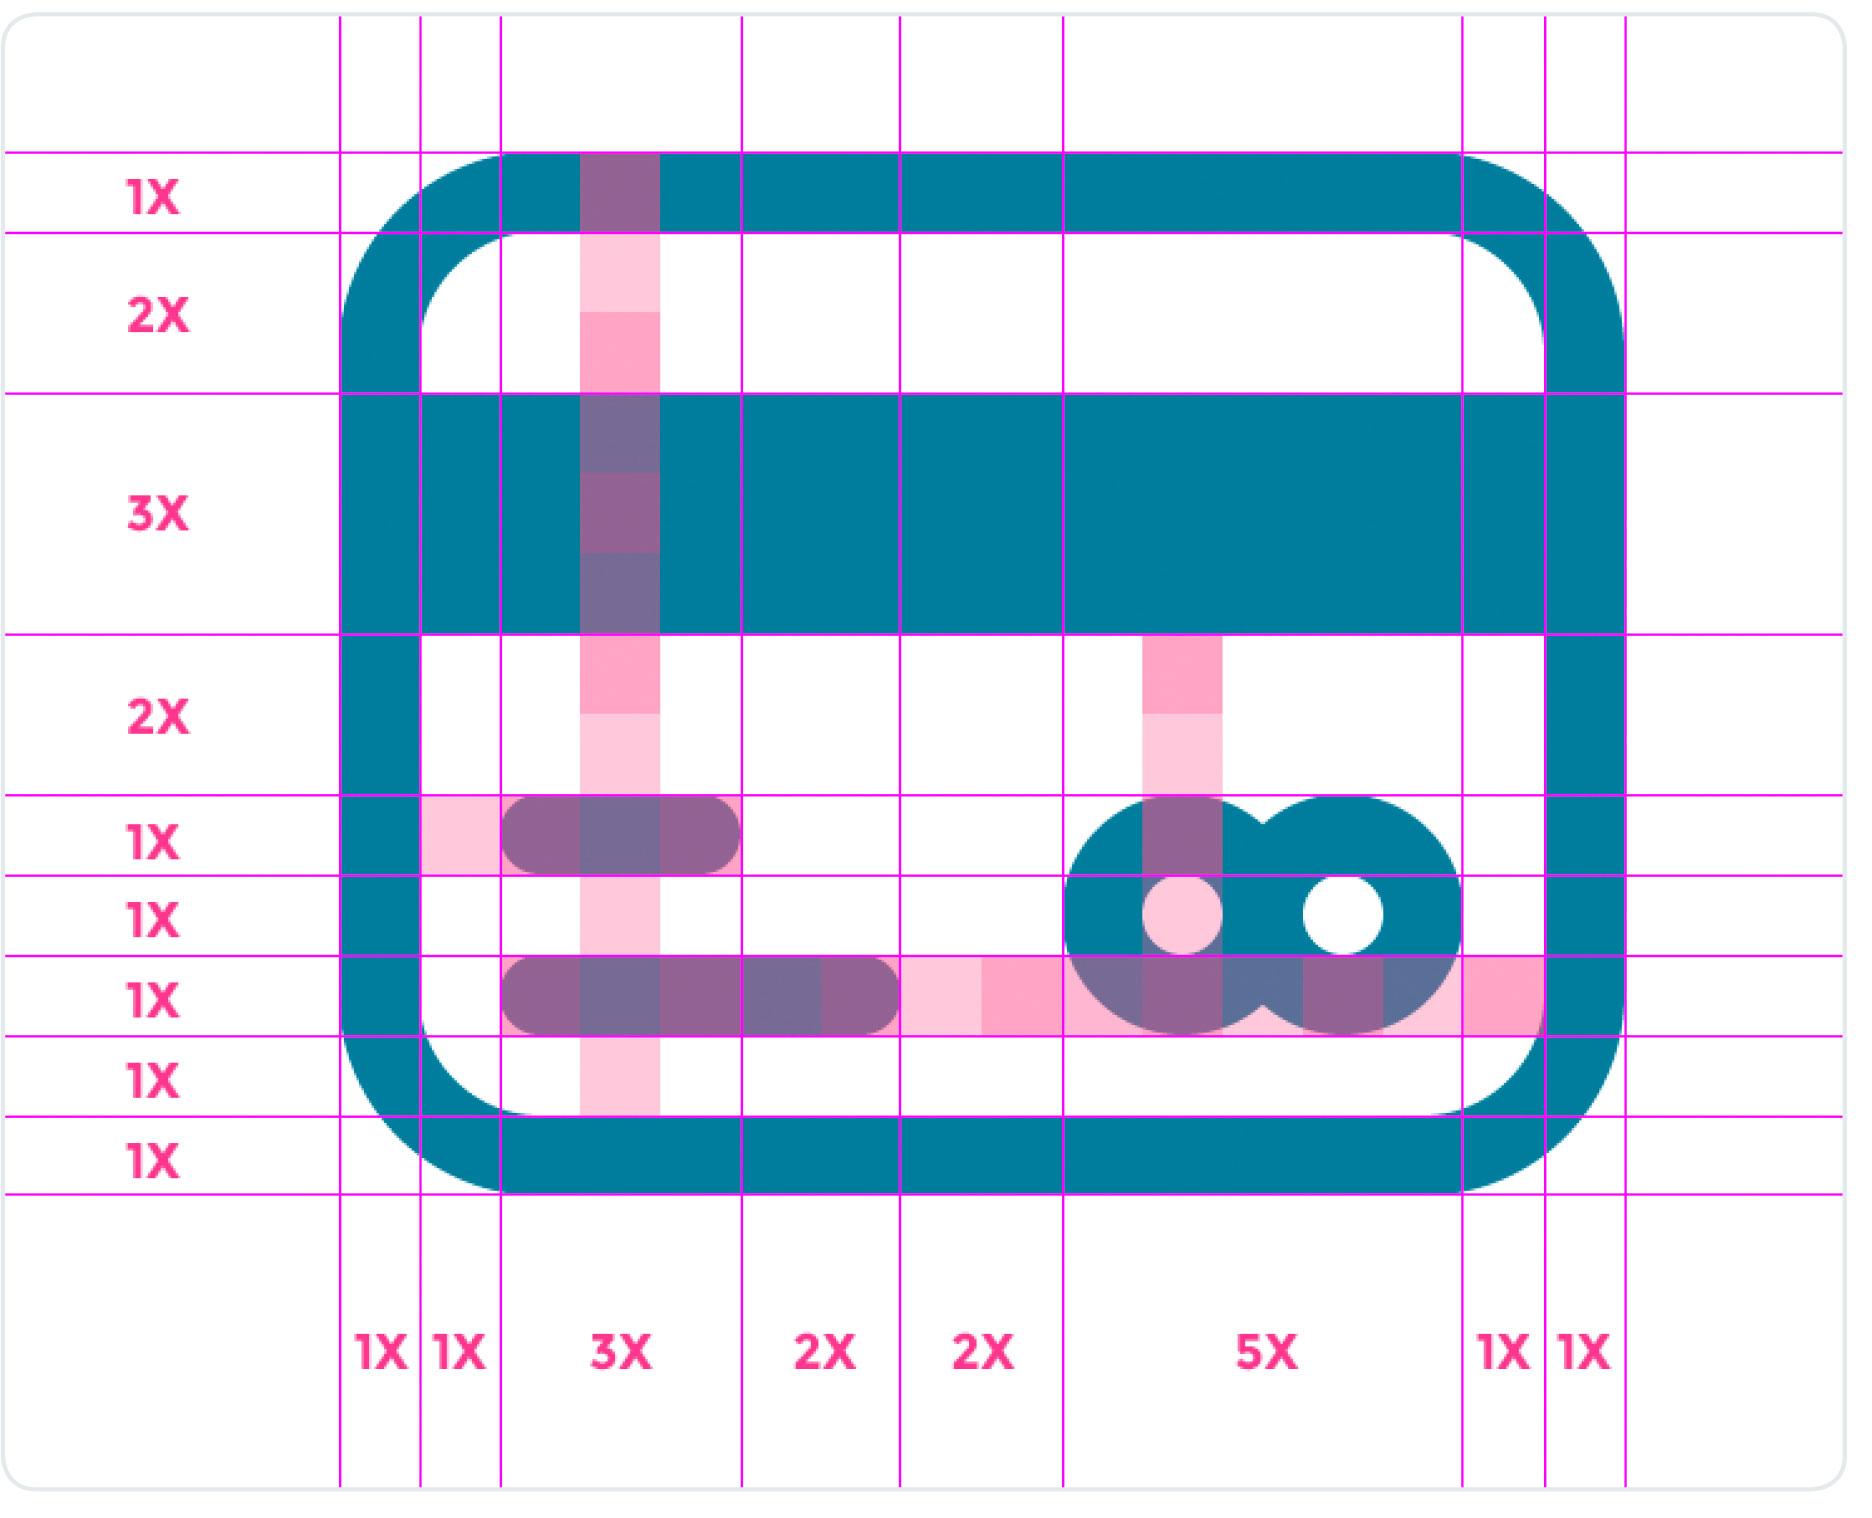 alignement-espacement-icon